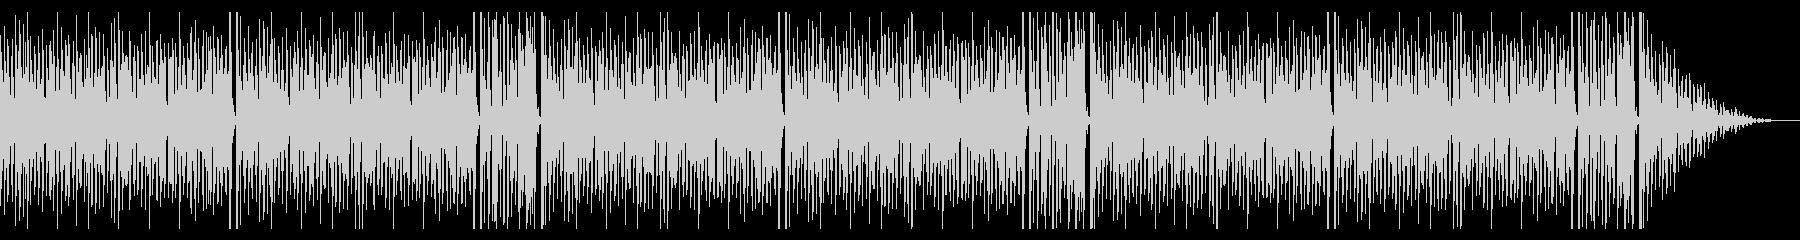 bgm33の未再生の波形